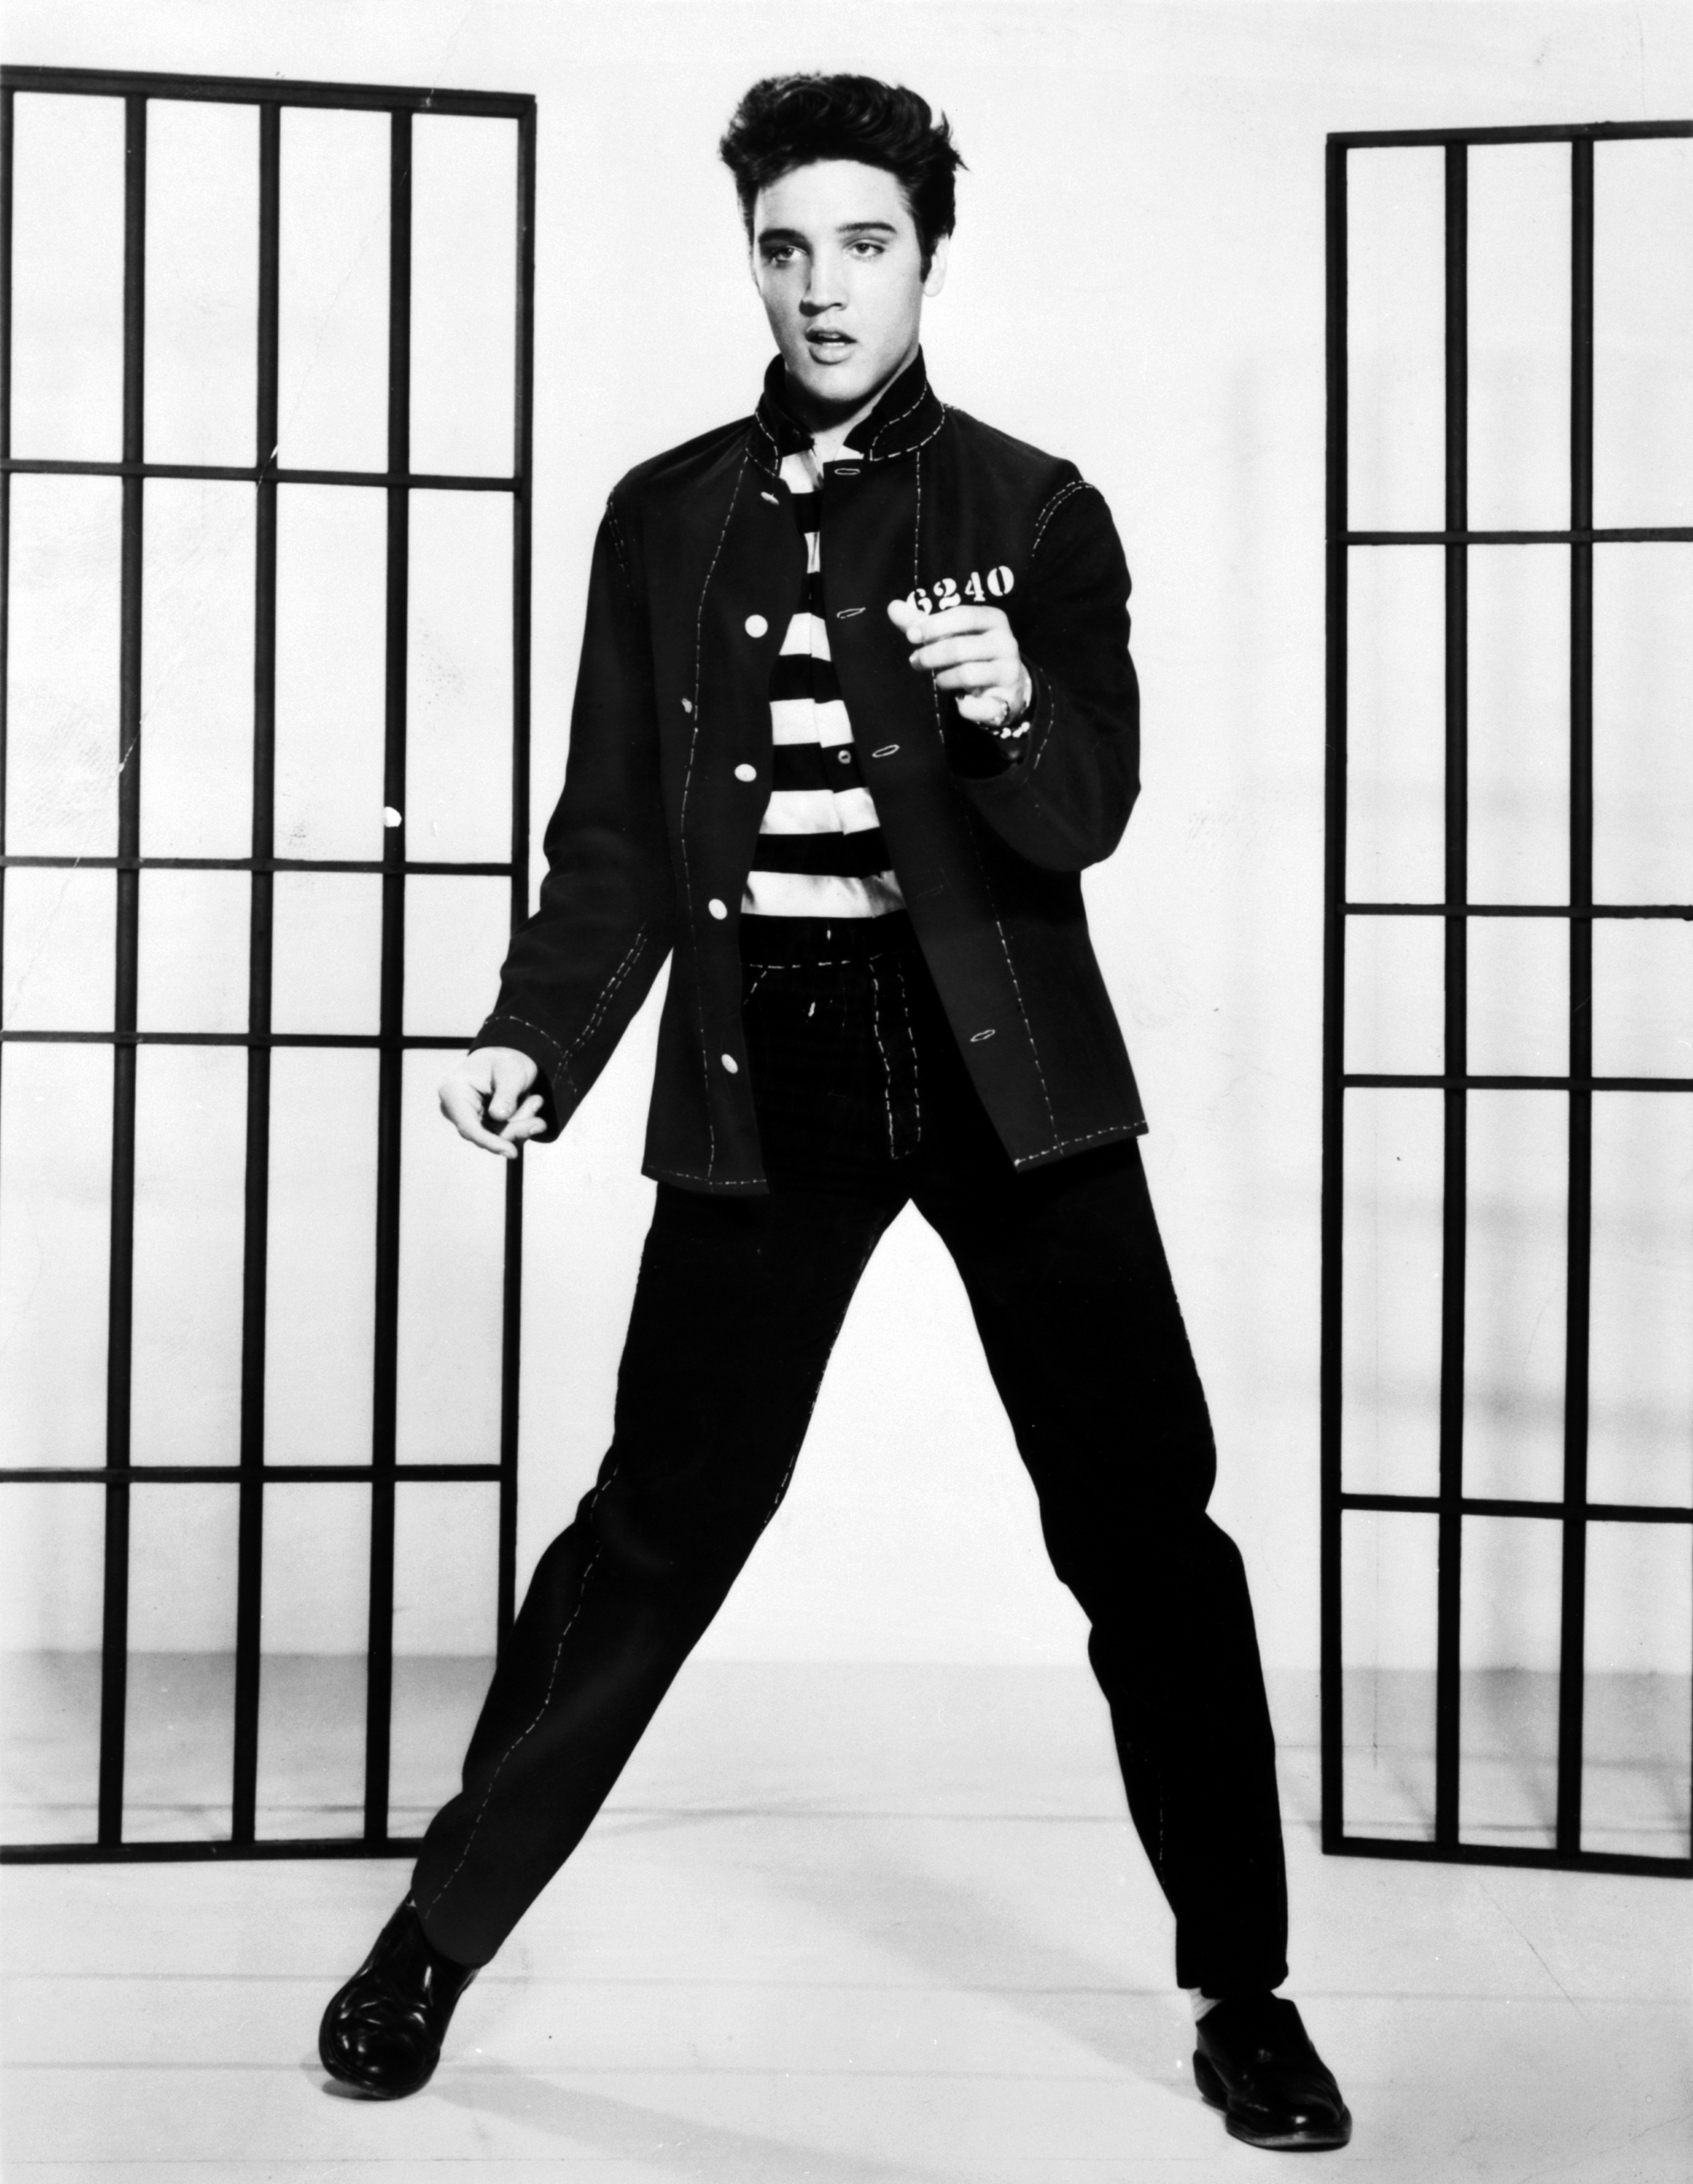 Elvis Presley's Jailhouse Rock